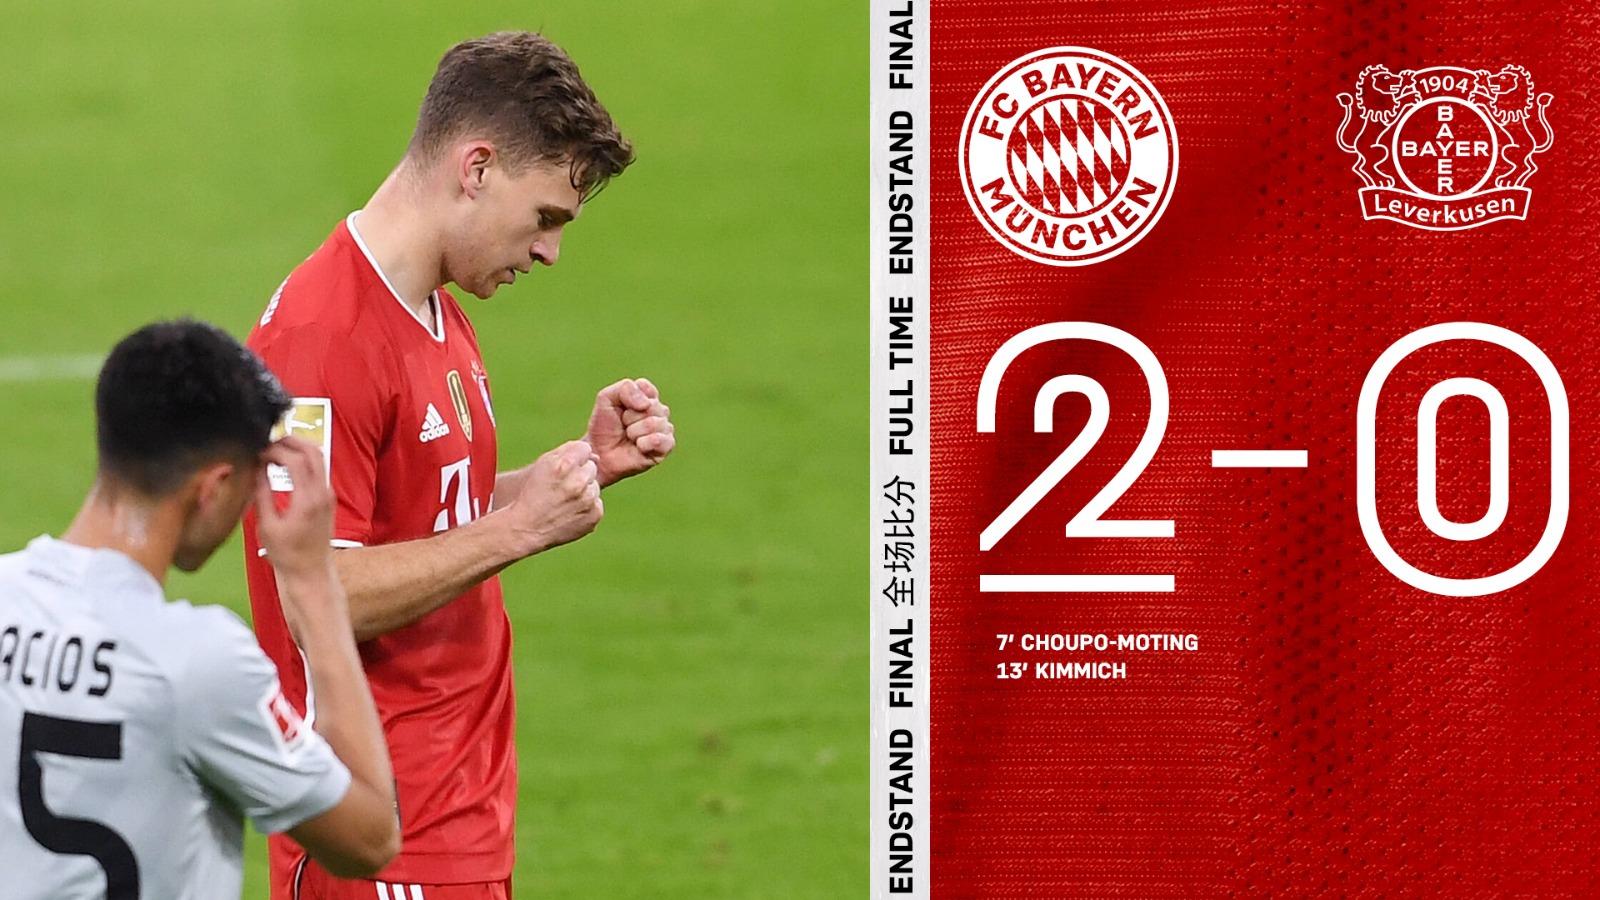 Bayern Munich băng băng về đích ở Bundesliga - Ảnh 1.